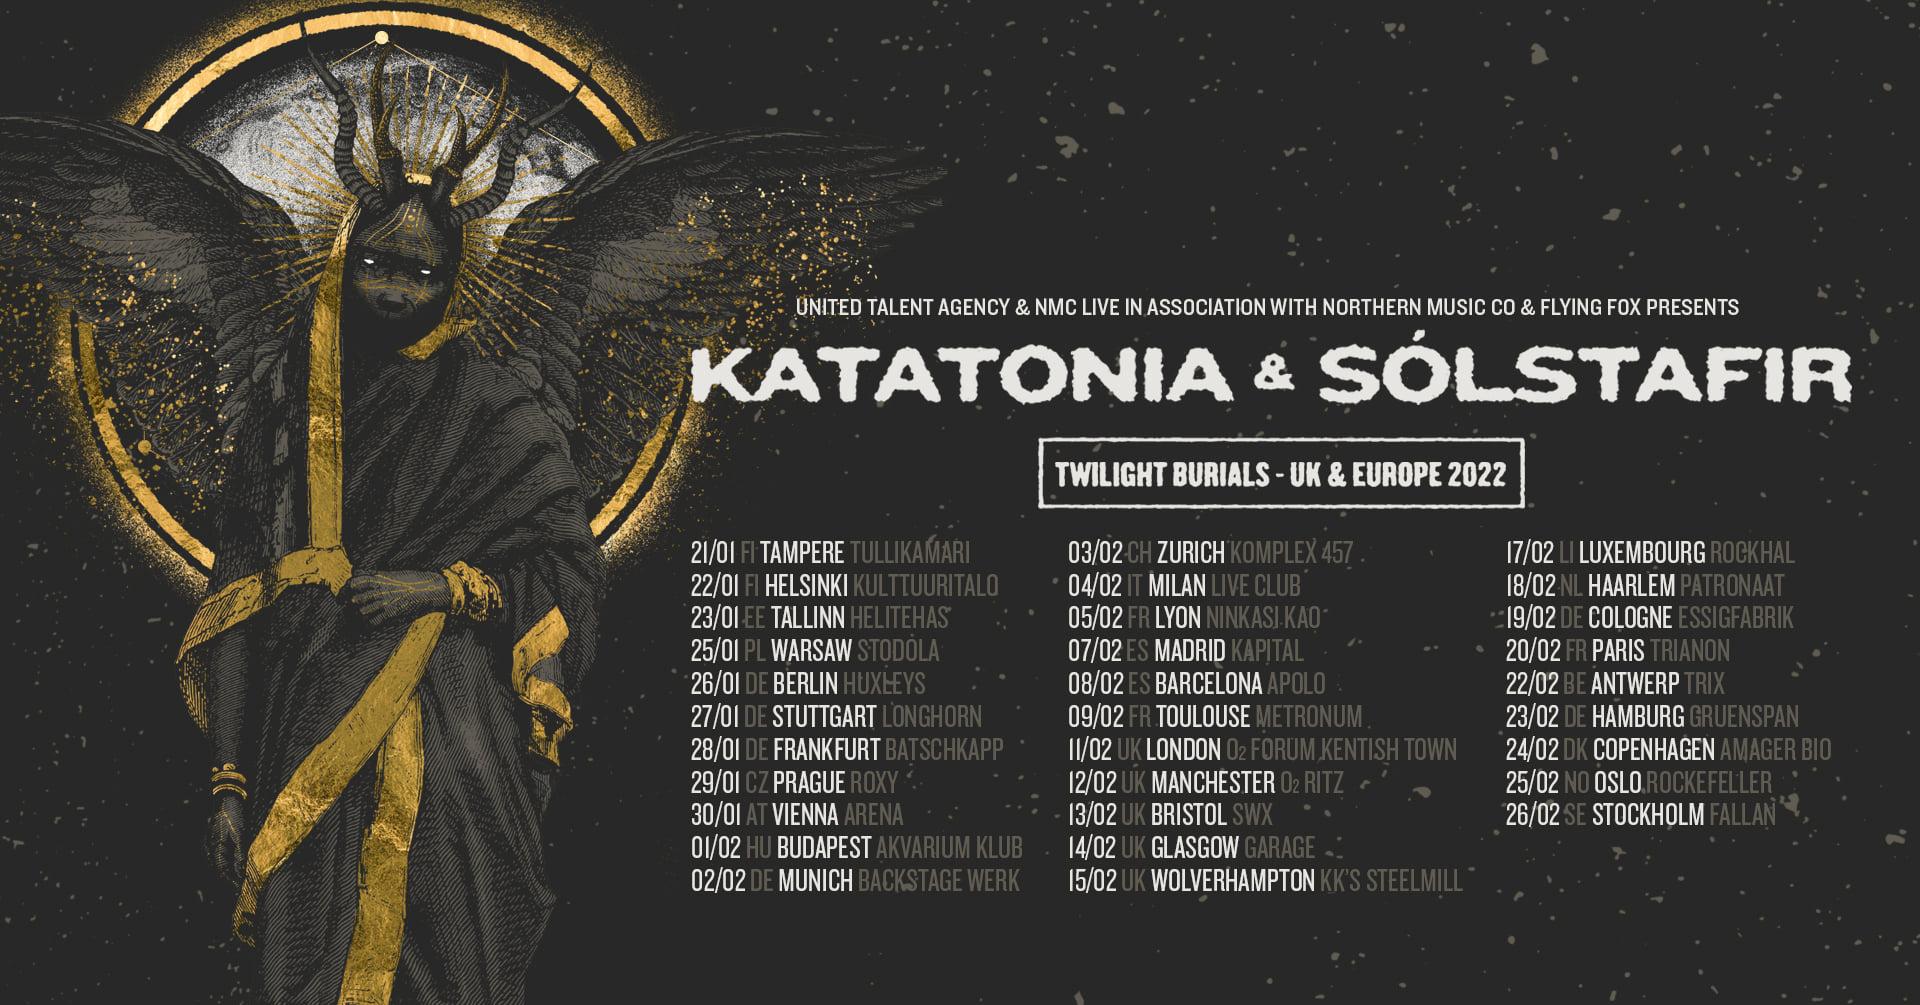 Katatonia & Solstafir Tour 2022 Flyer